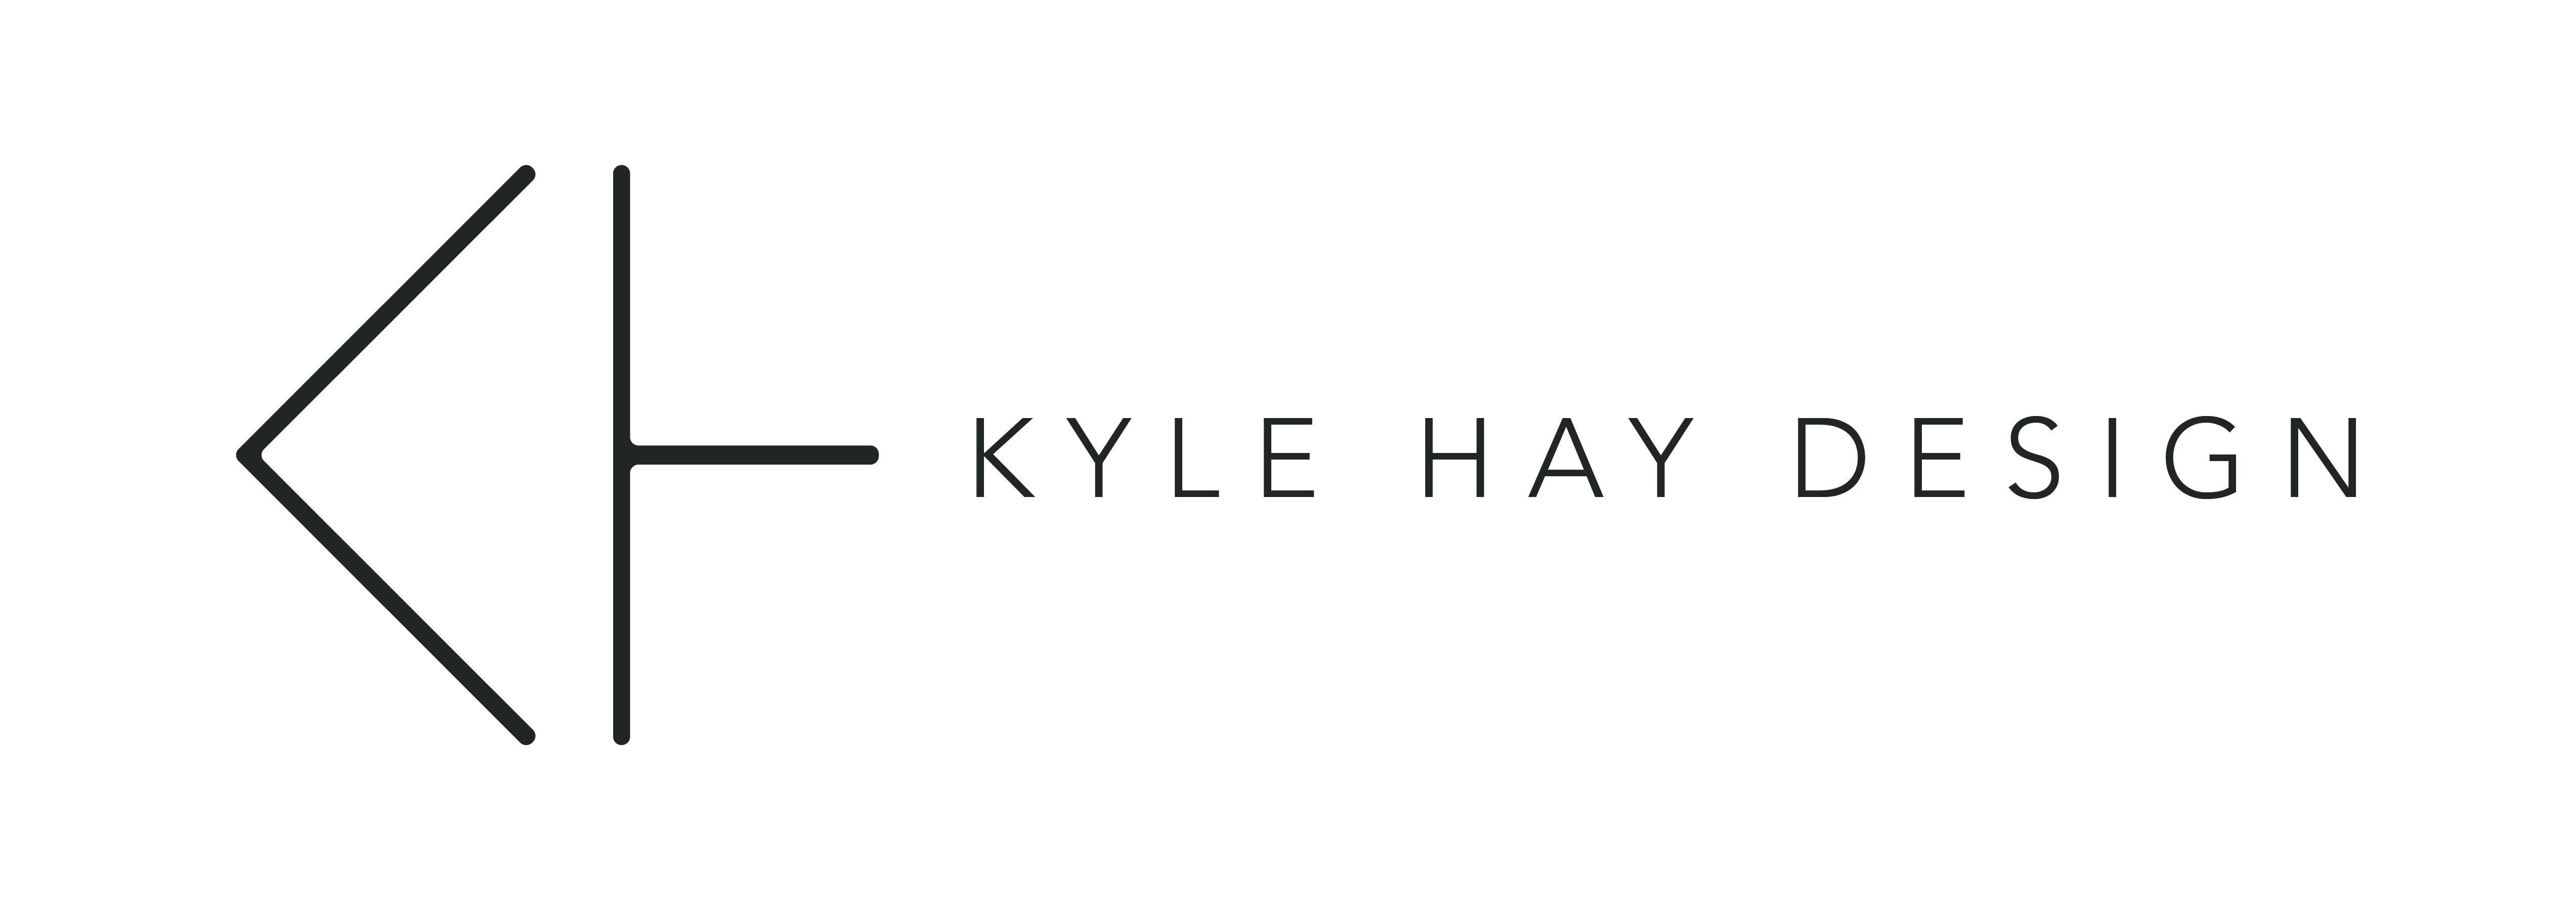 Kyle Hay